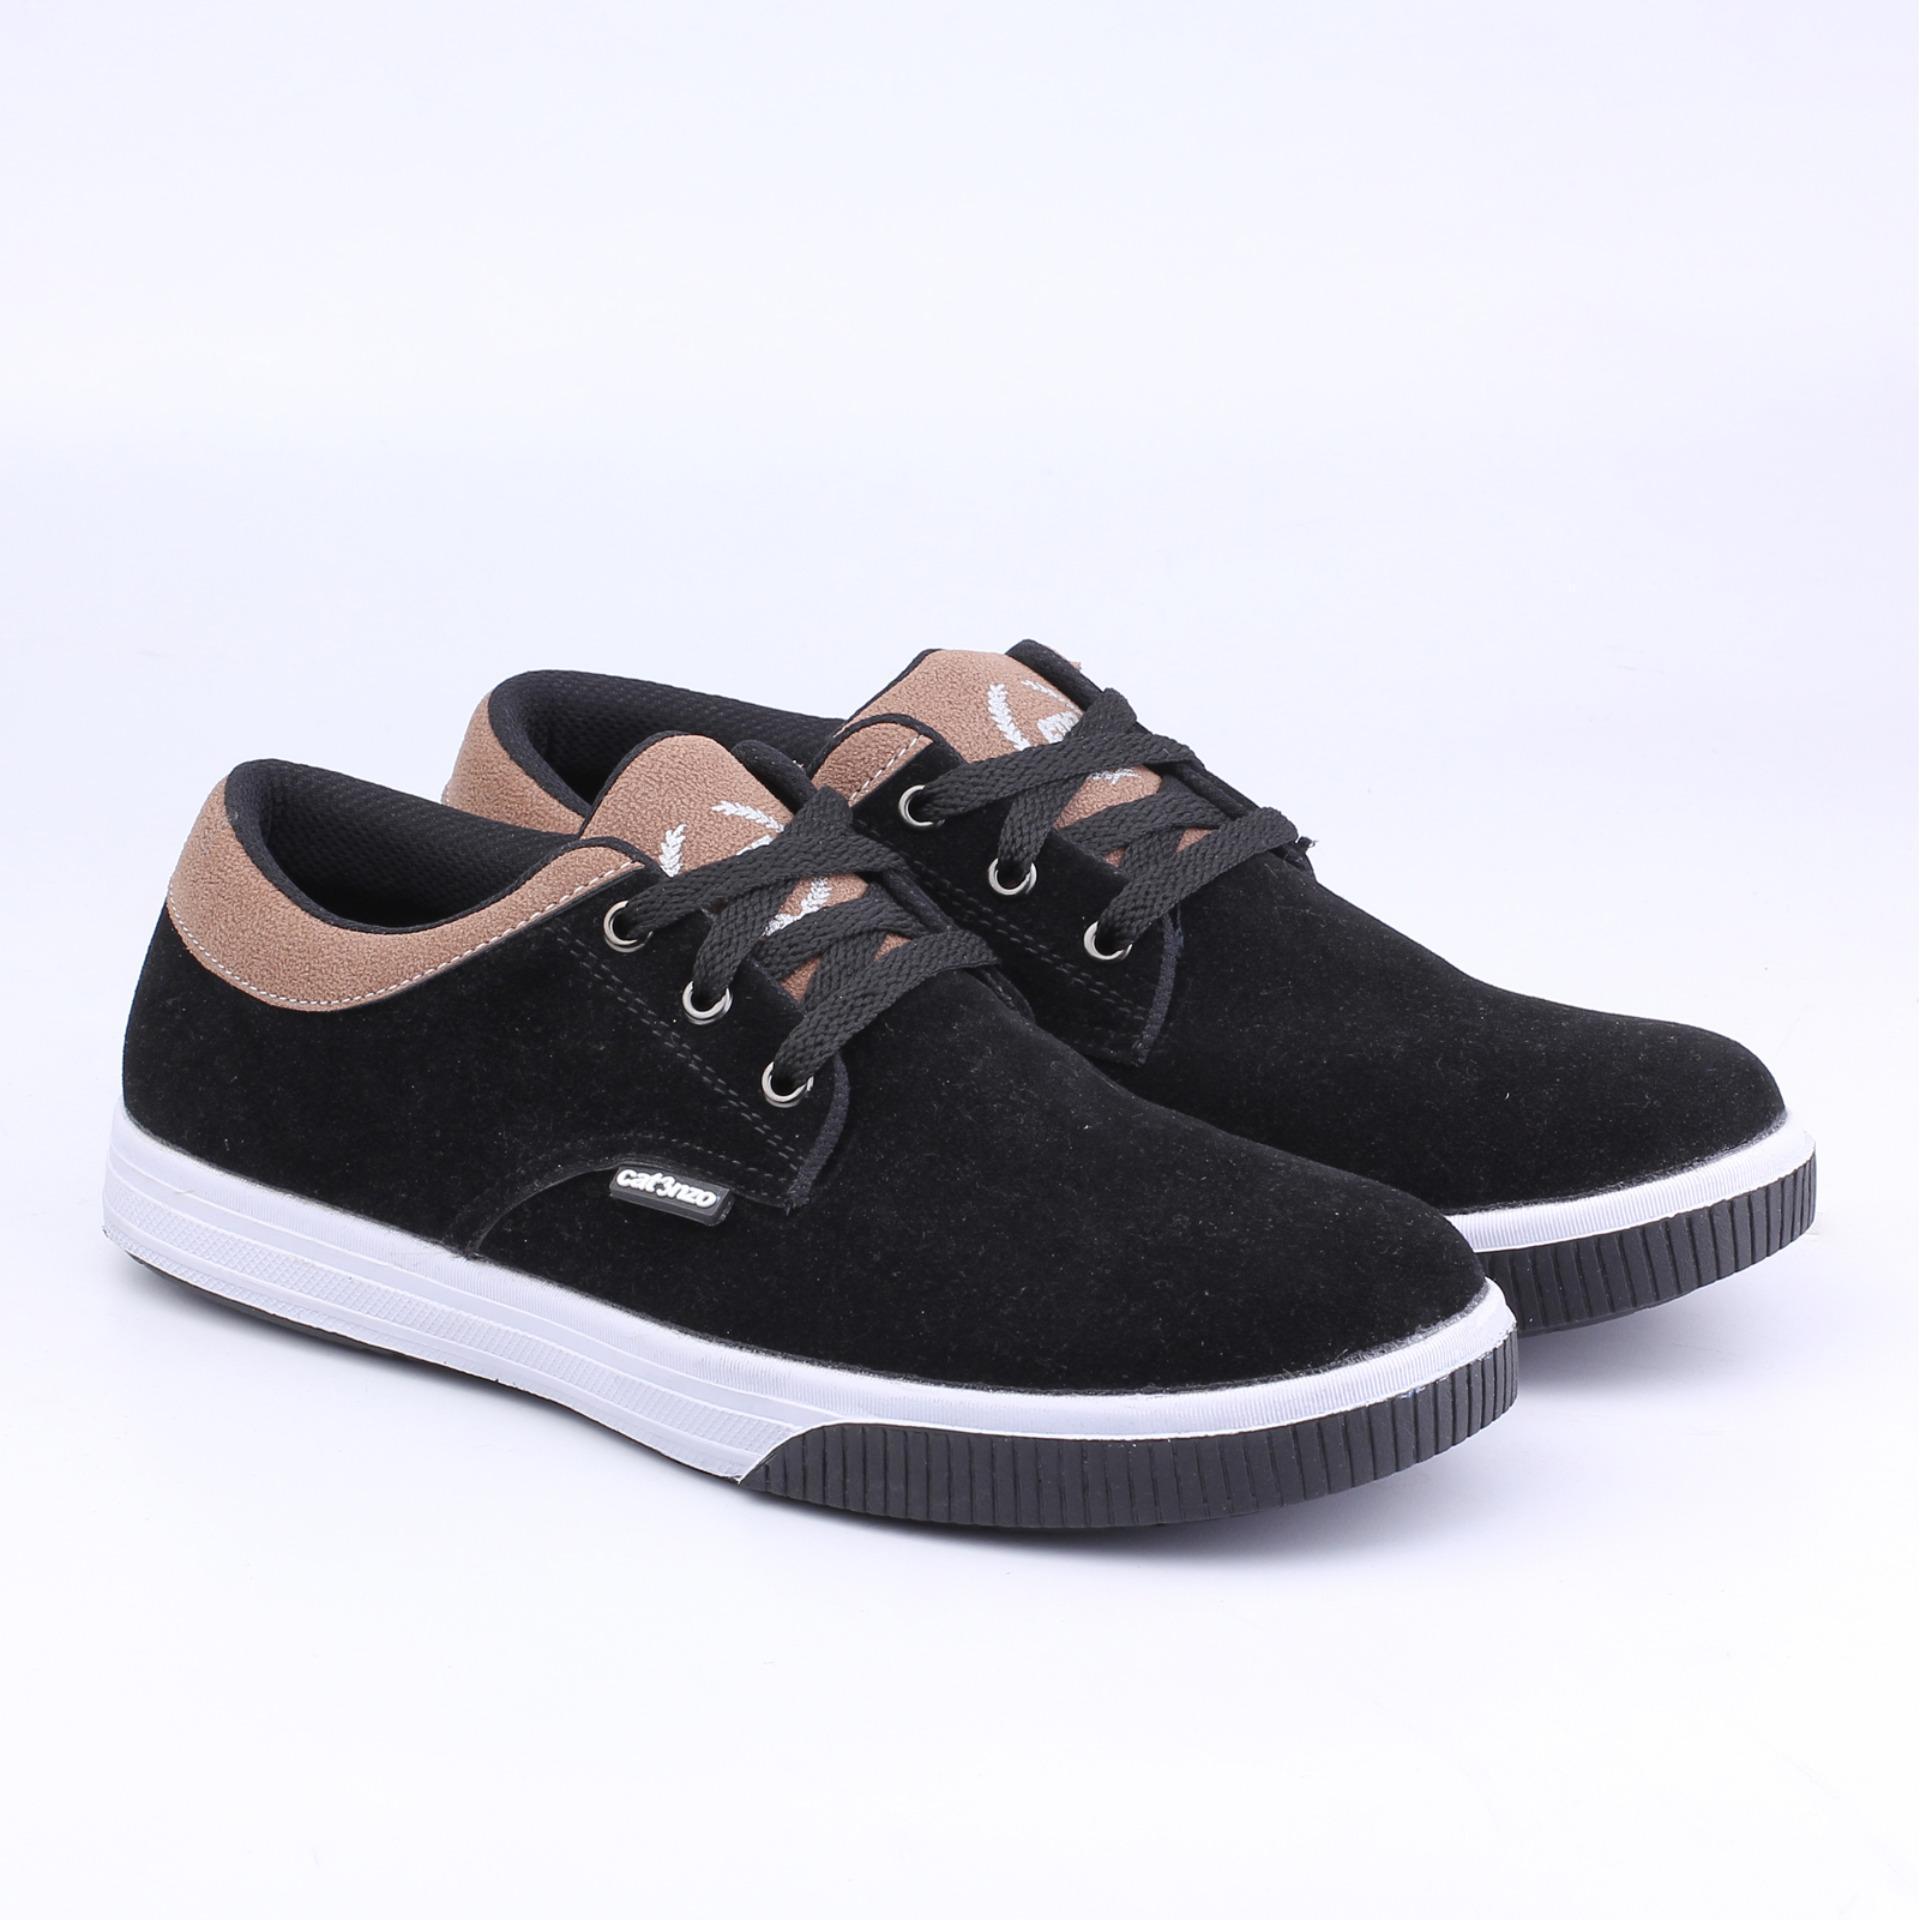 Sepatu Sneakers Pria Casual Kets Navy OriginalIDR157000. Rp 157.200 aba376343a